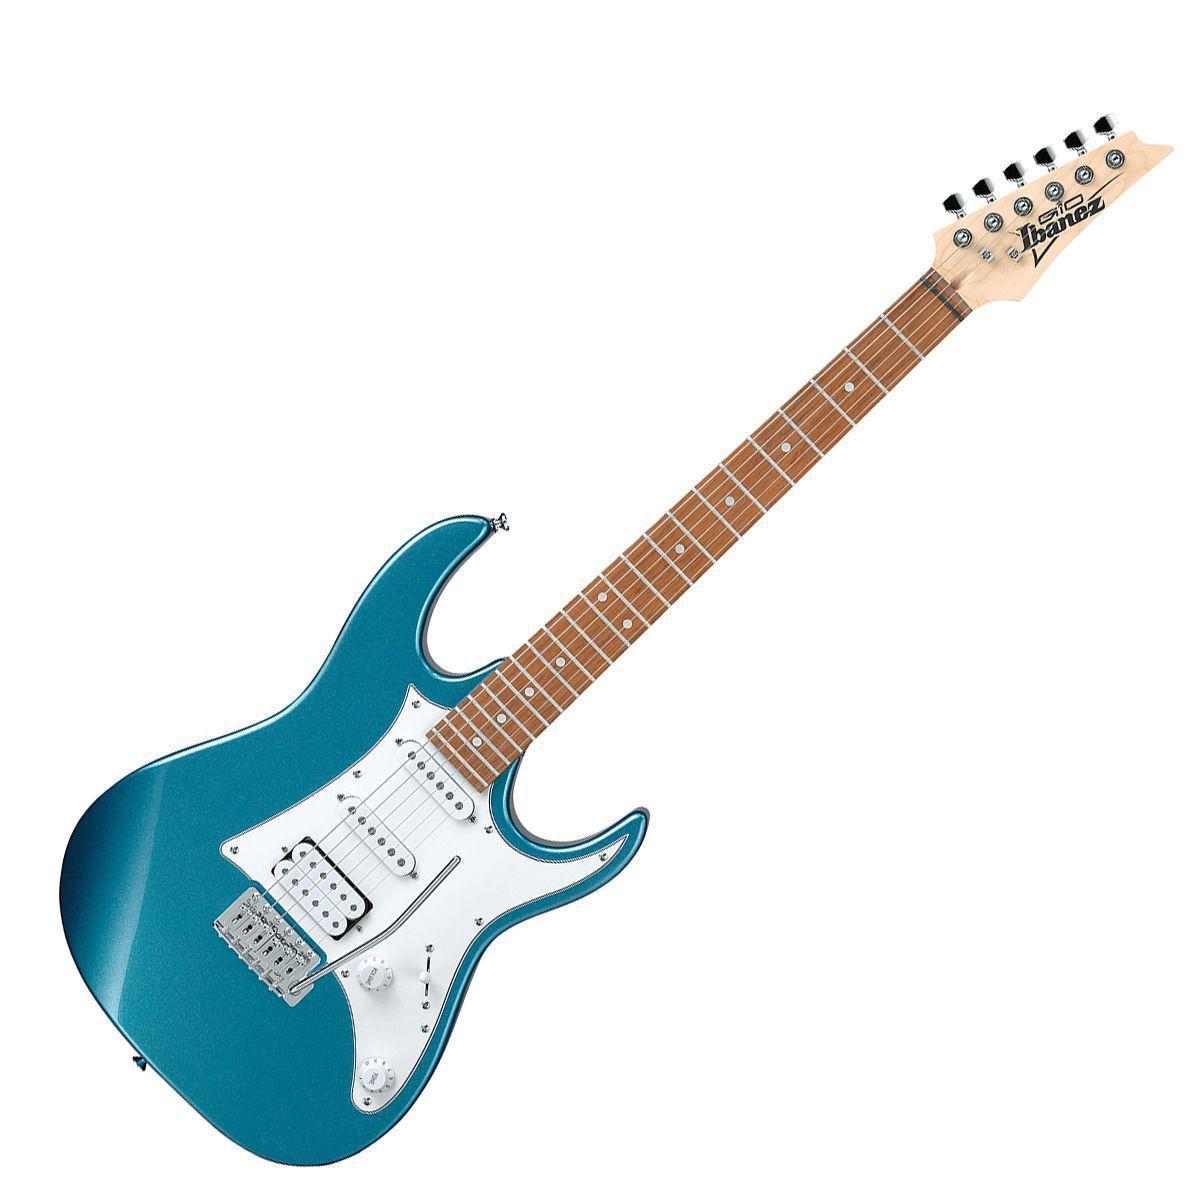 Guitarra Ibanez GRX40 MLB Metallic Blue  - MegaLojaSP